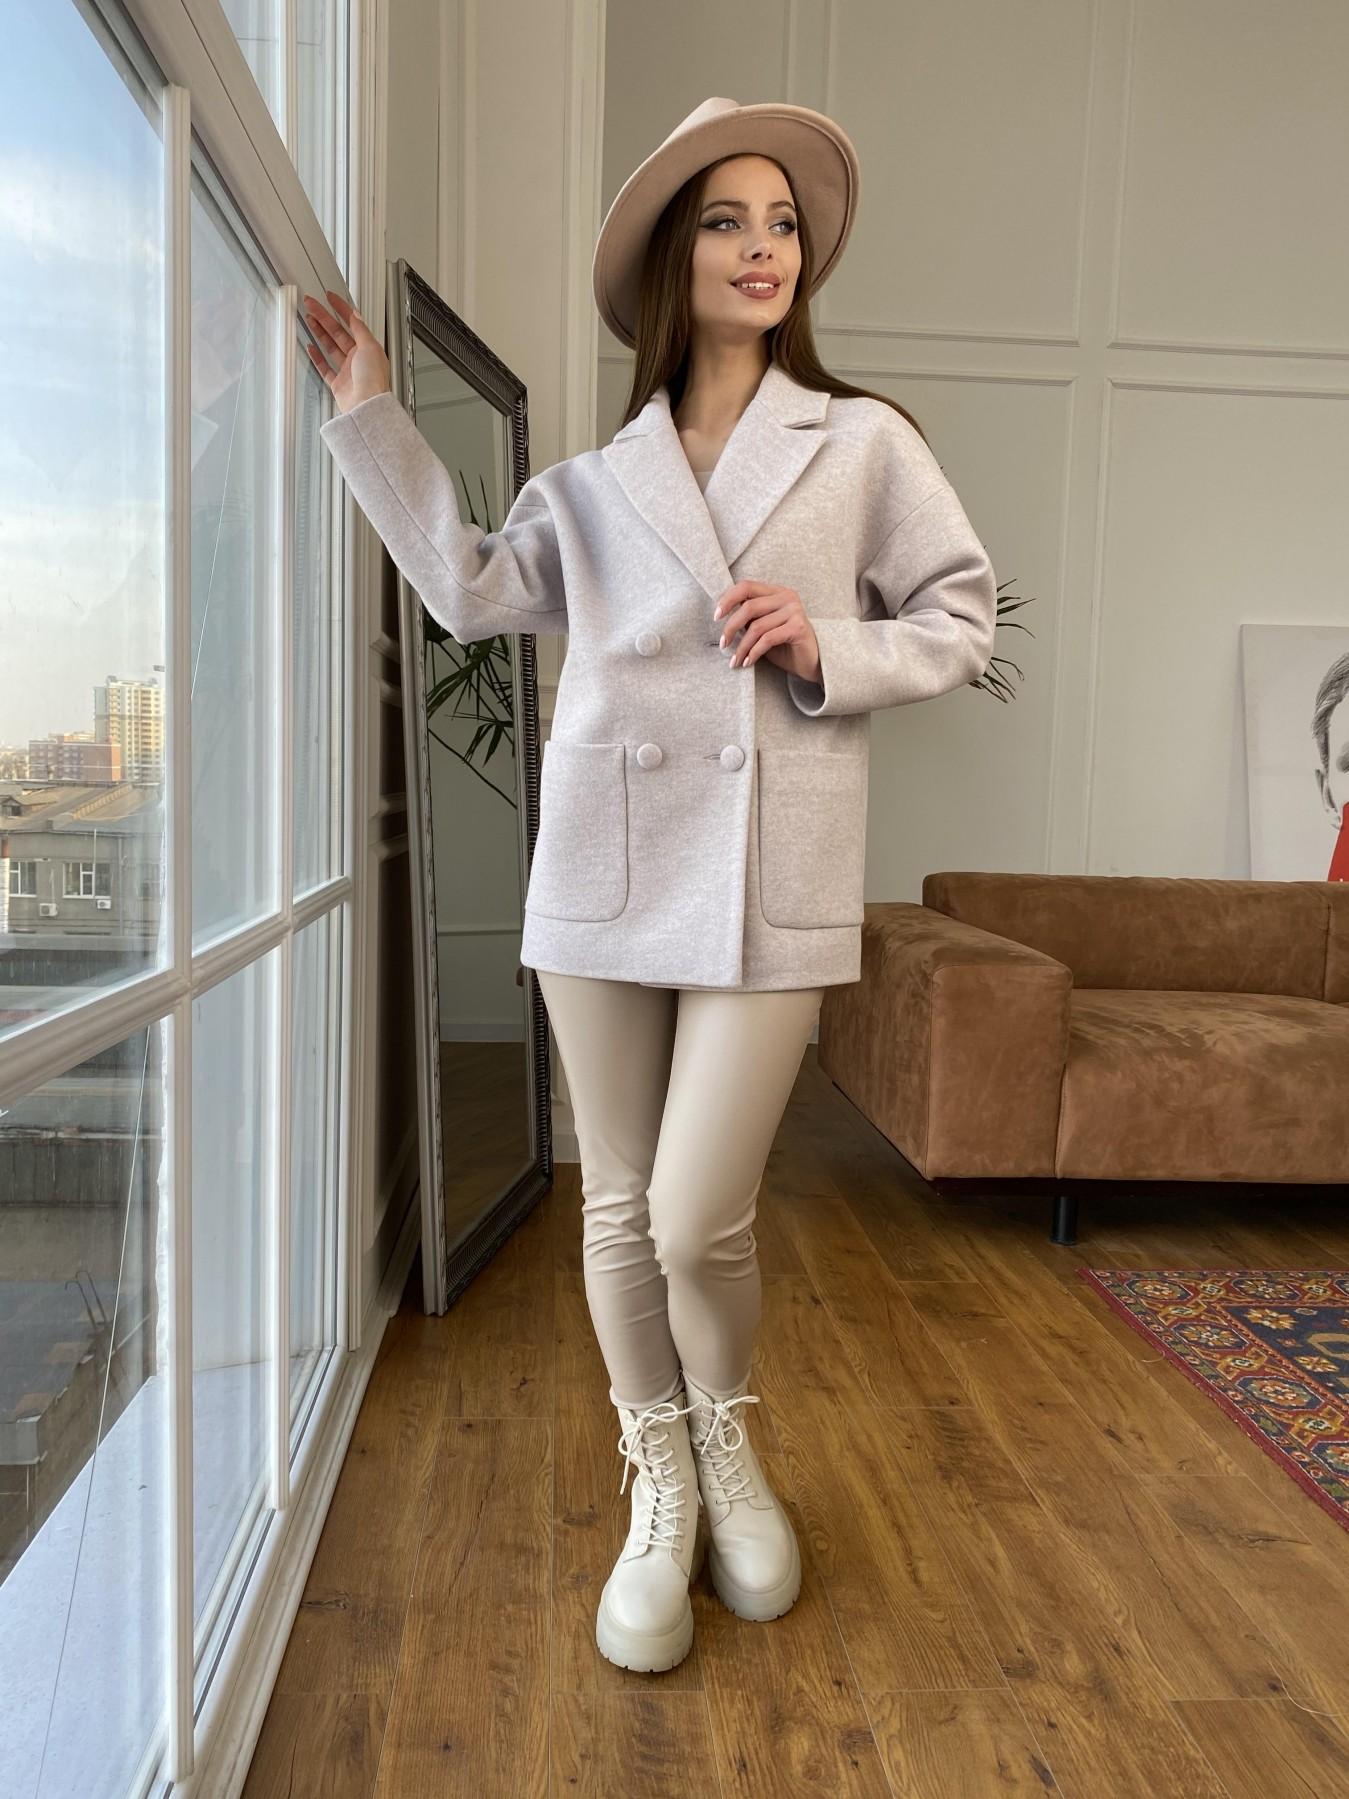 Мансера пальто кашемир меланж на трикотаже  10629 АРТ. 47553 Цвет: Бежевый меланж - фото 4, интернет магазин tm-modus.ru